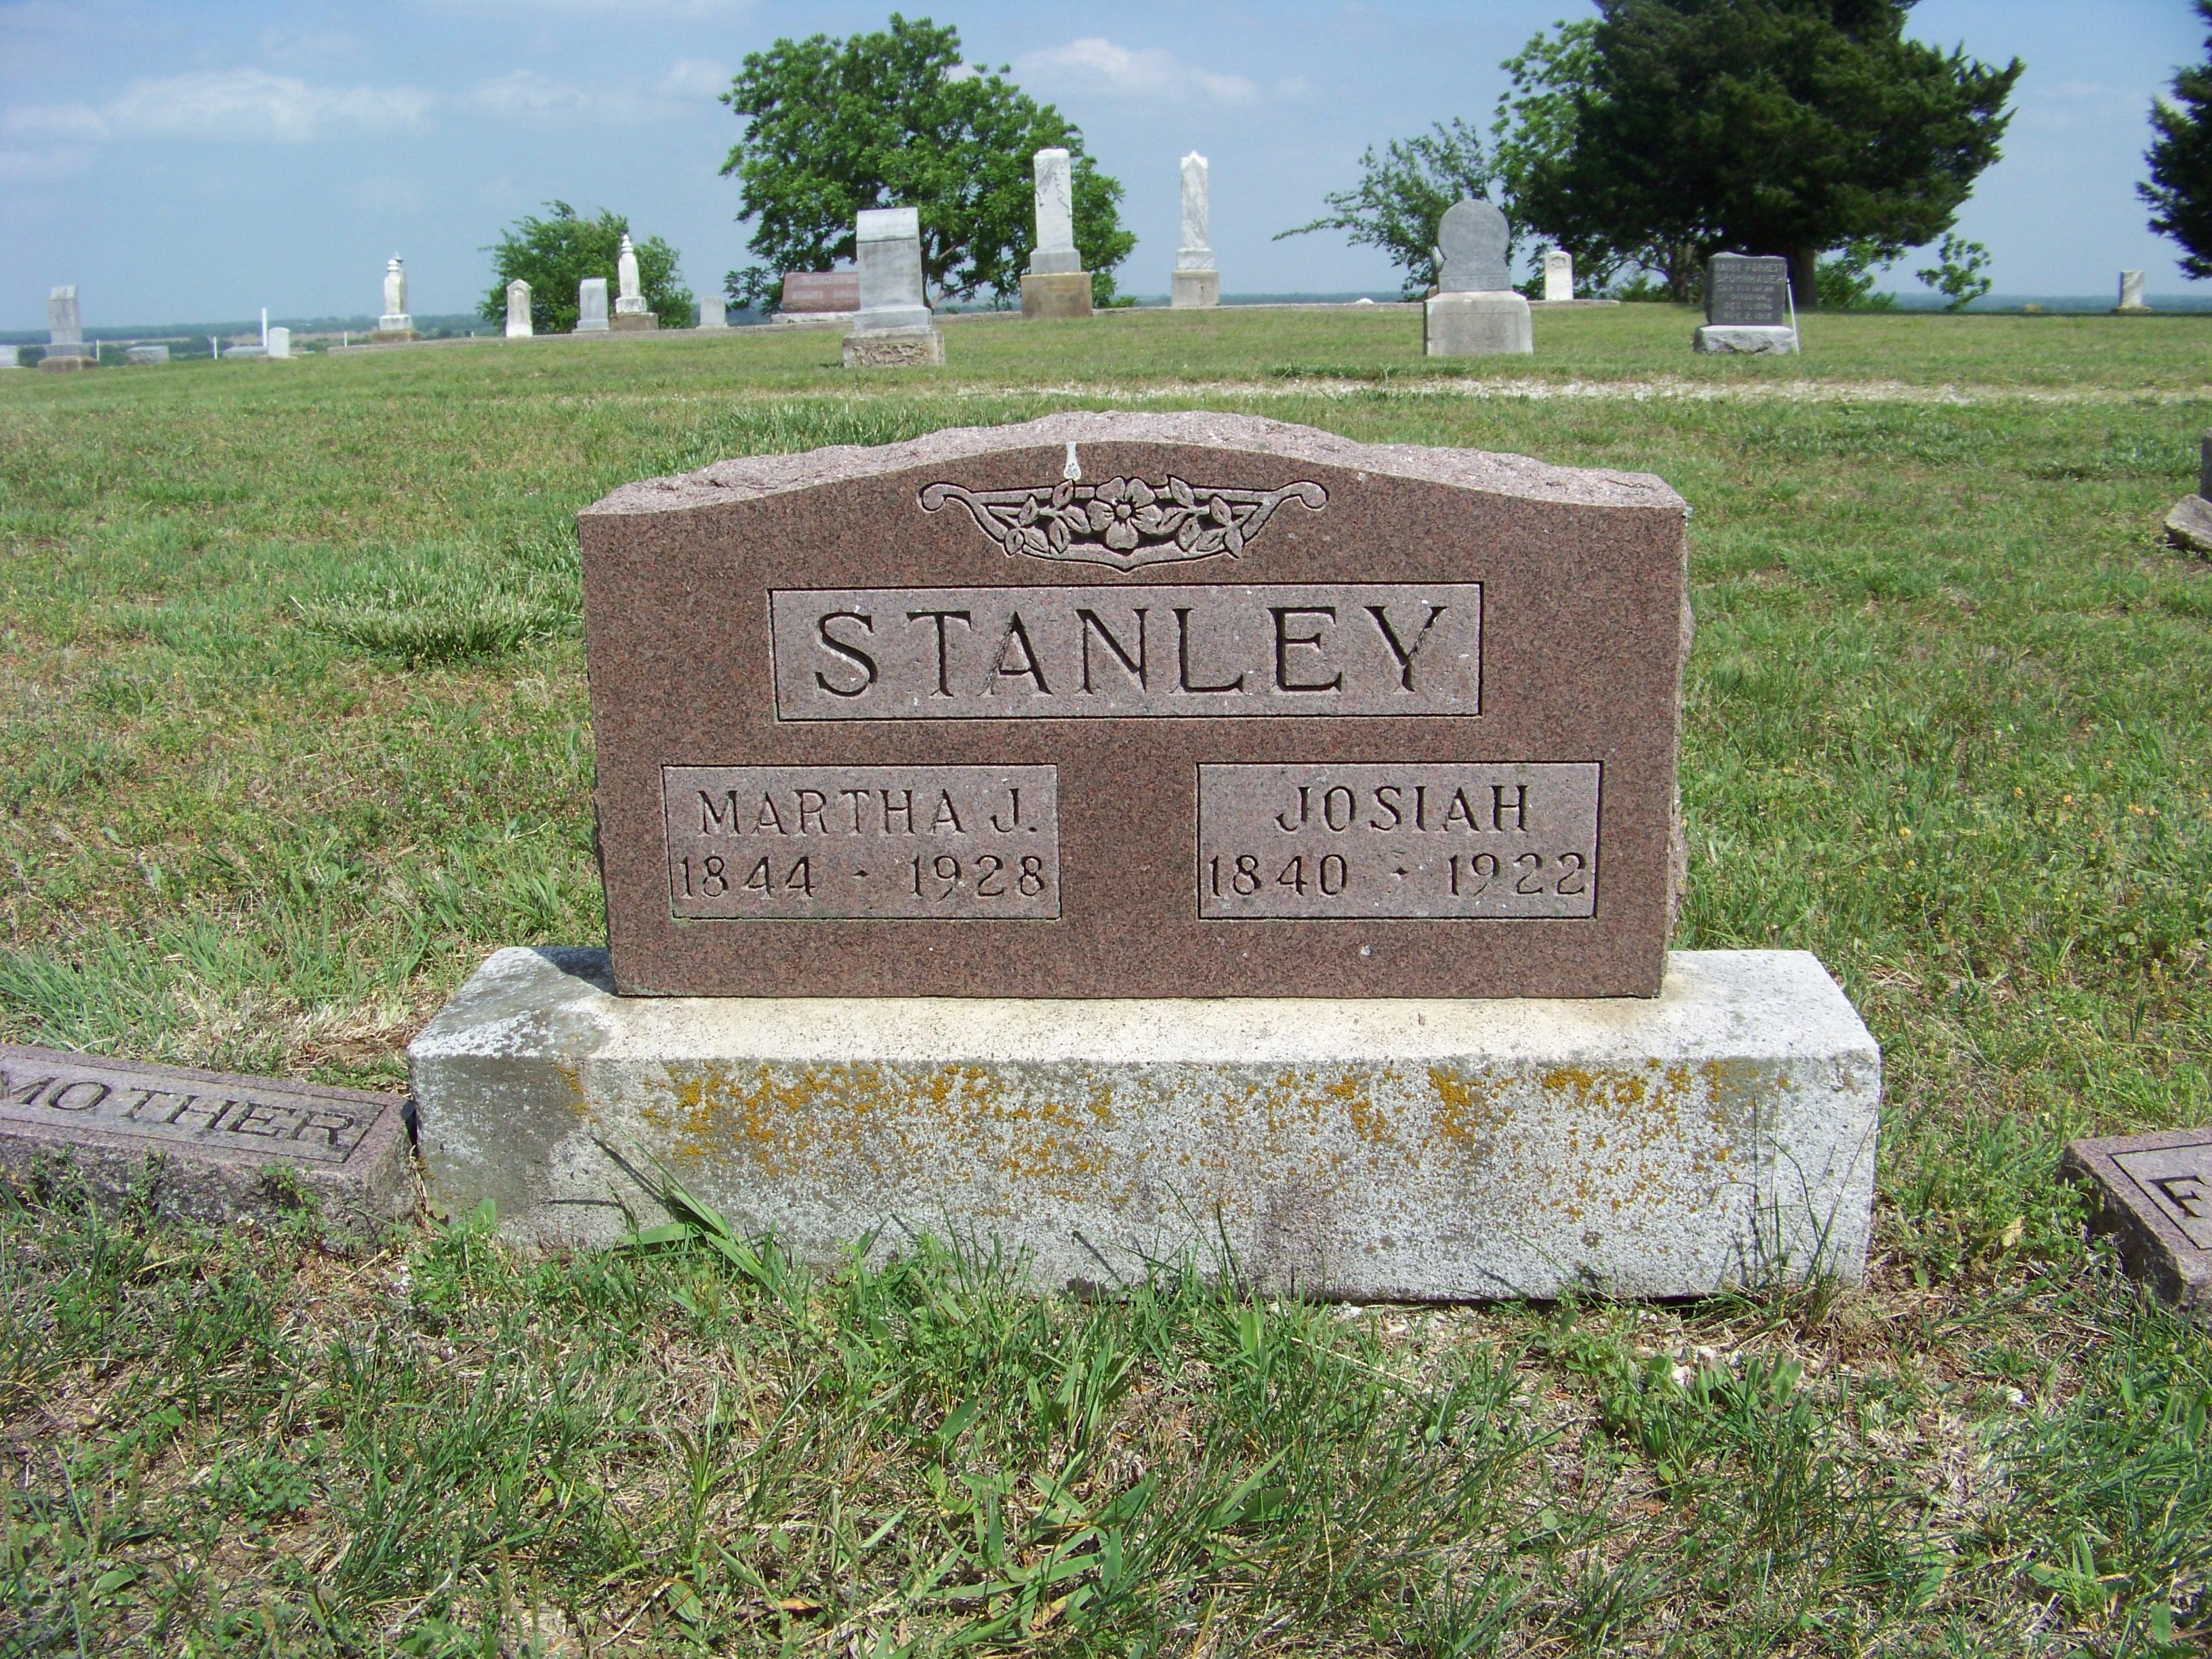 Josiah Stanley